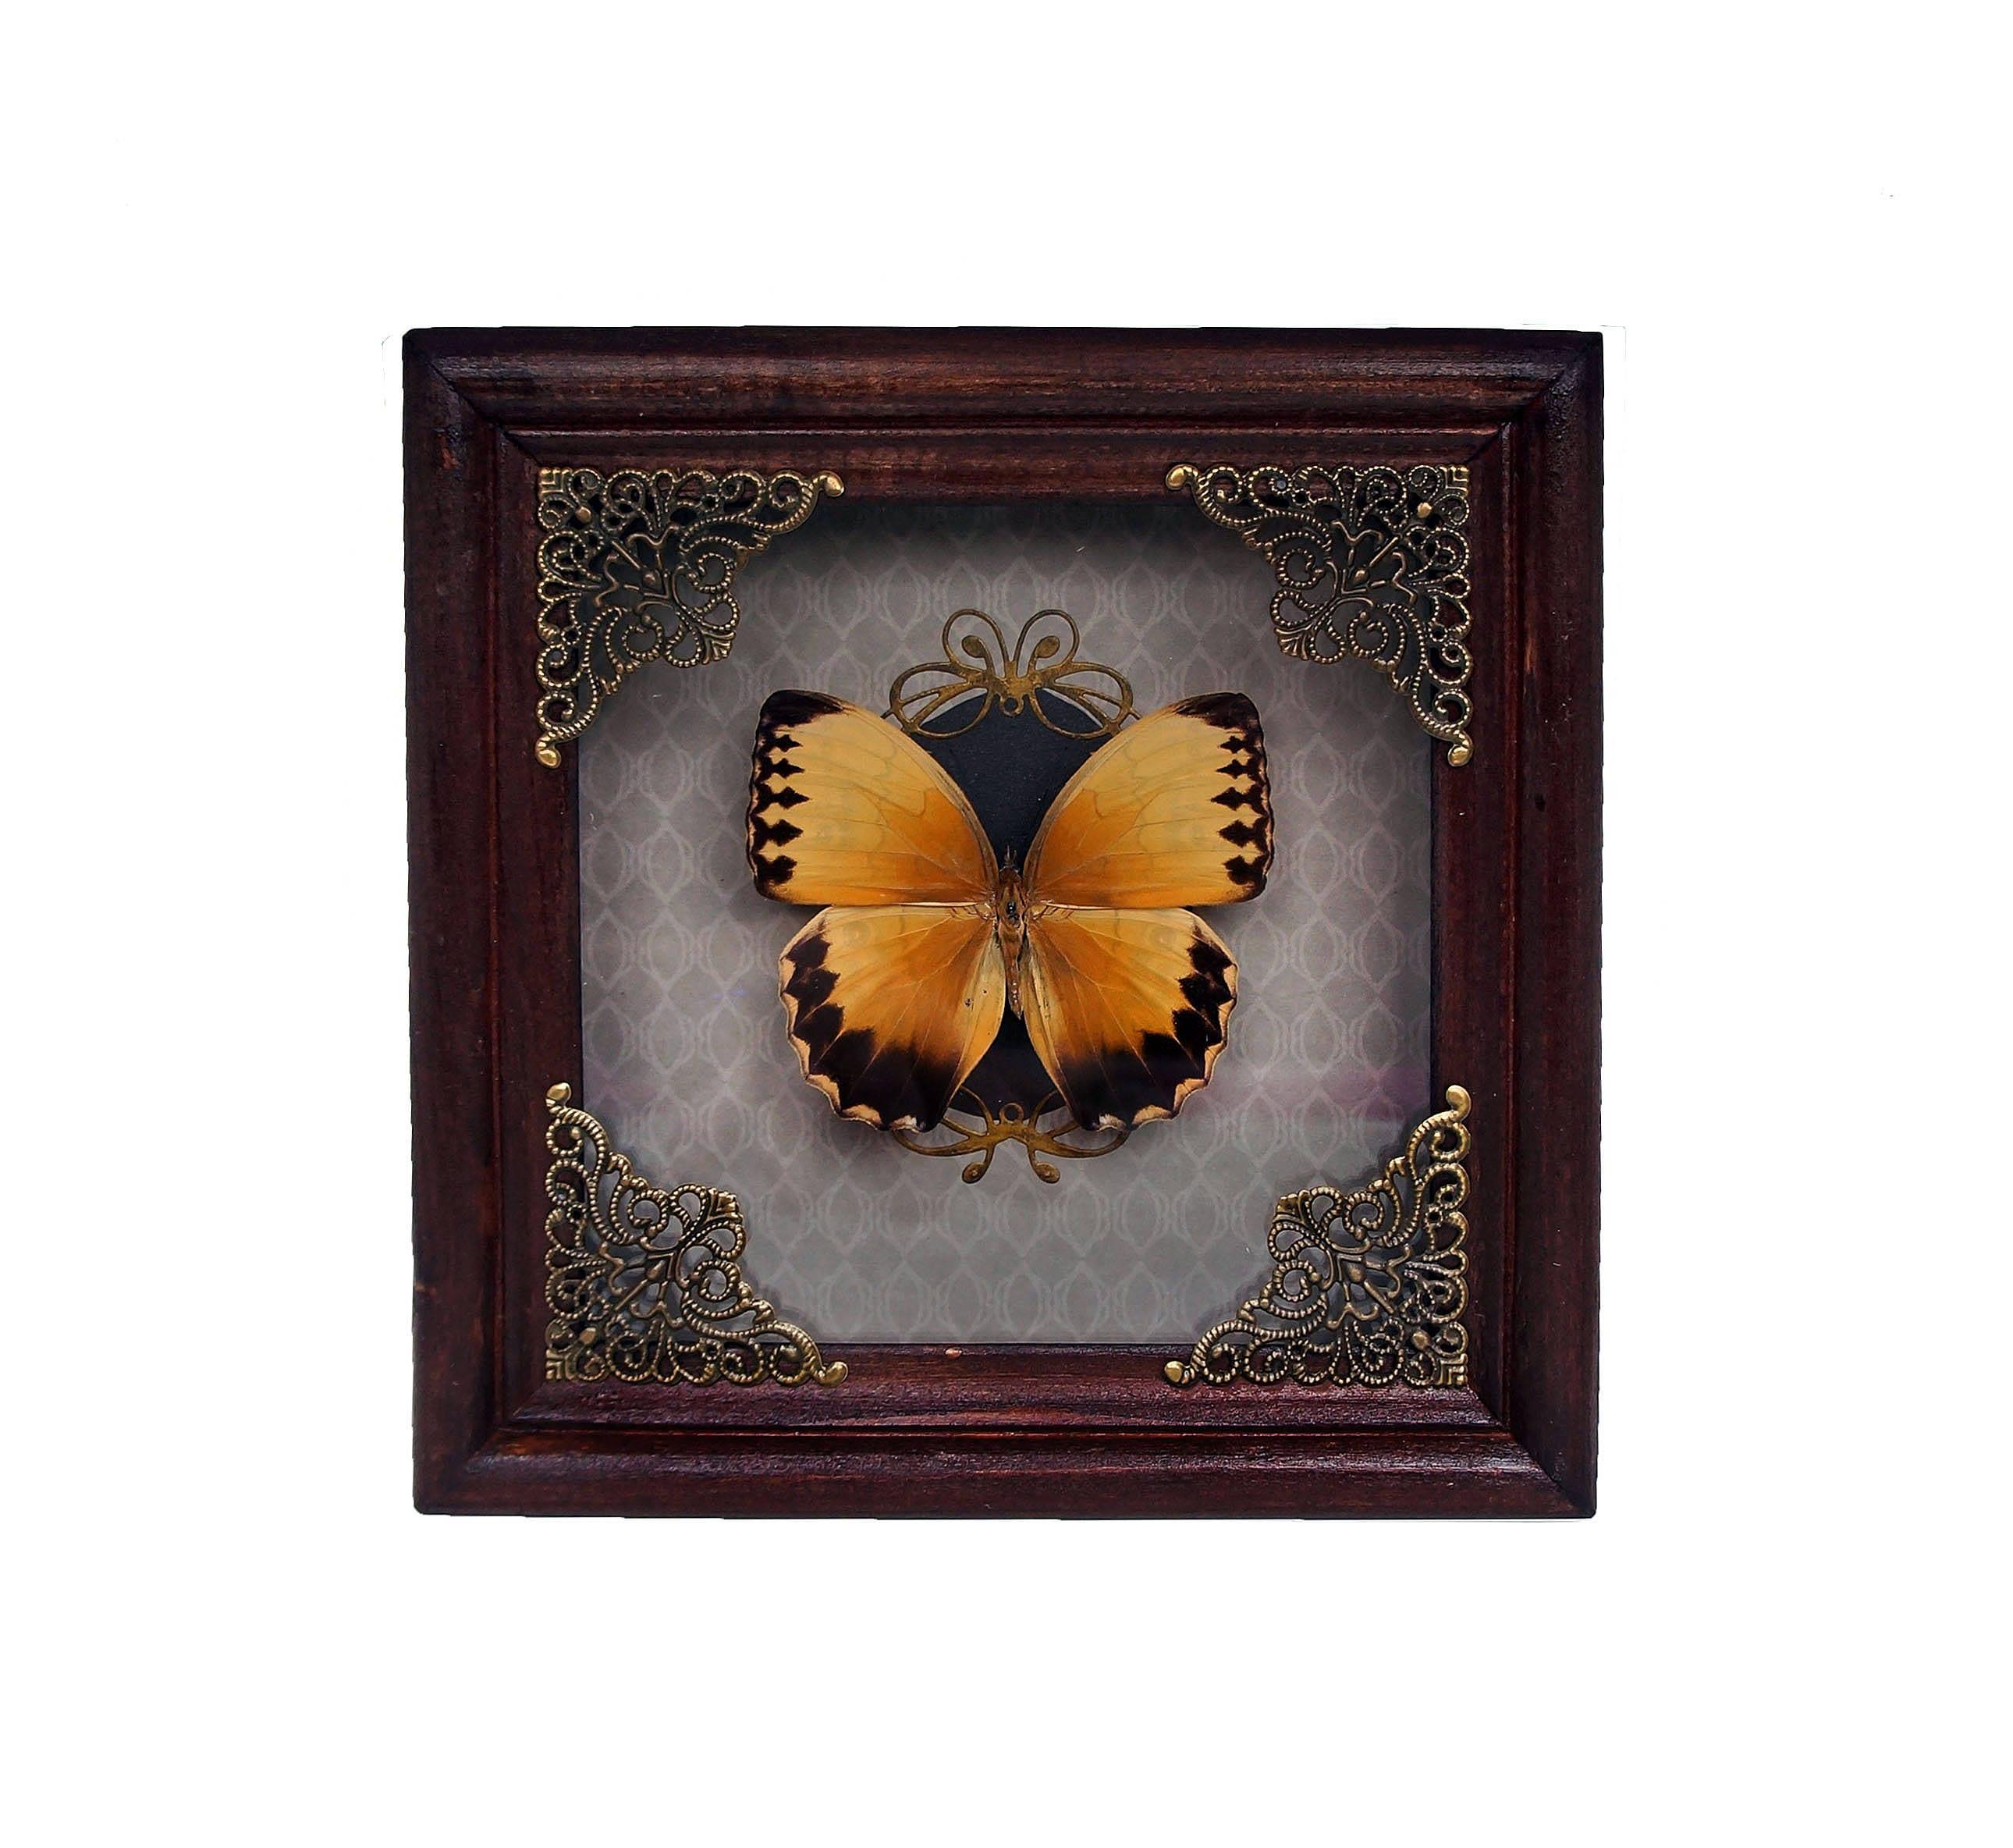 Entomologie Rahmen echter Schmetterling Stichophthalma Howqua